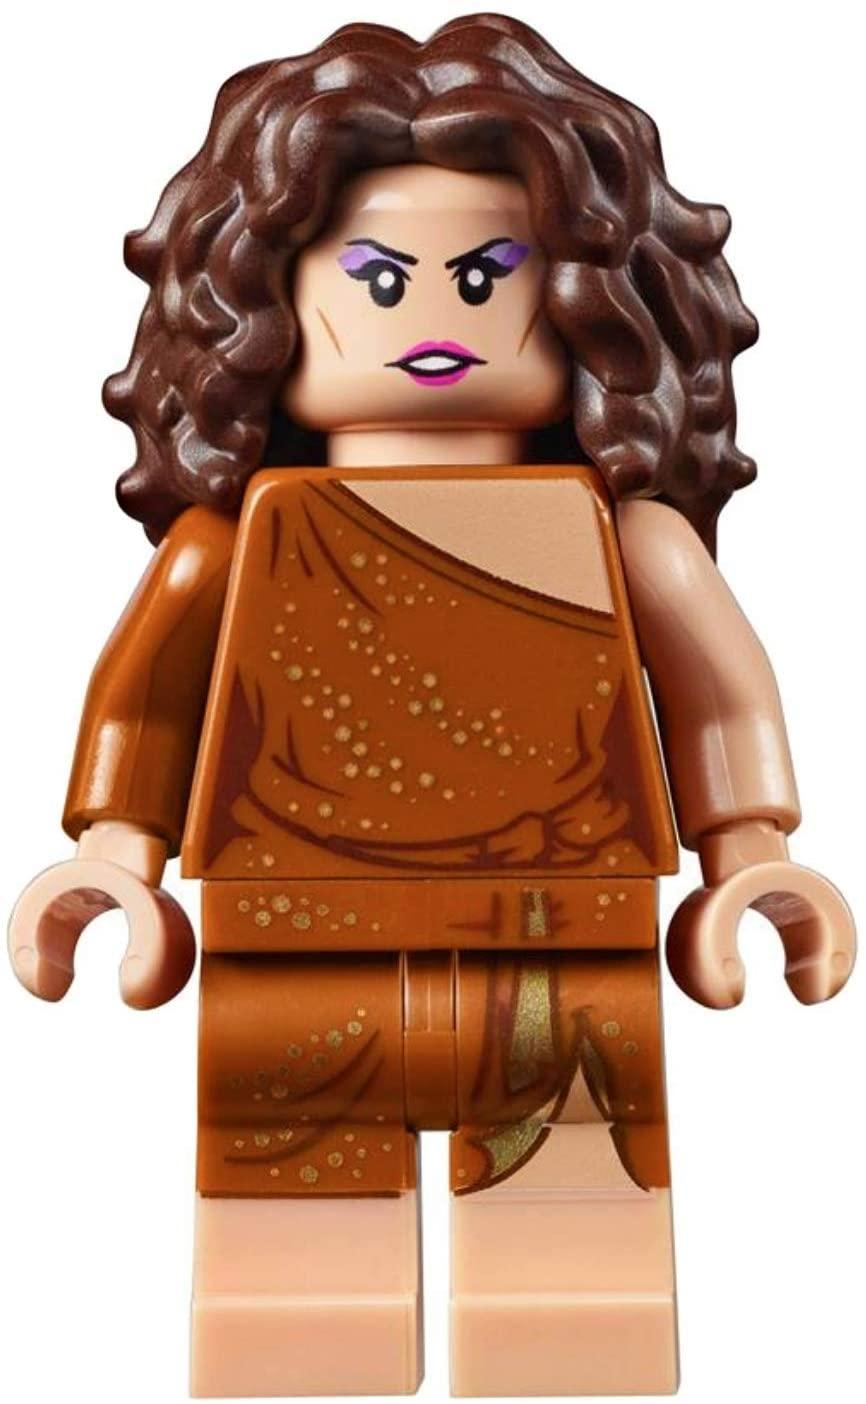 MINIFIGURES Lego Ghostbusters Dana Barrett (from Set 75827)